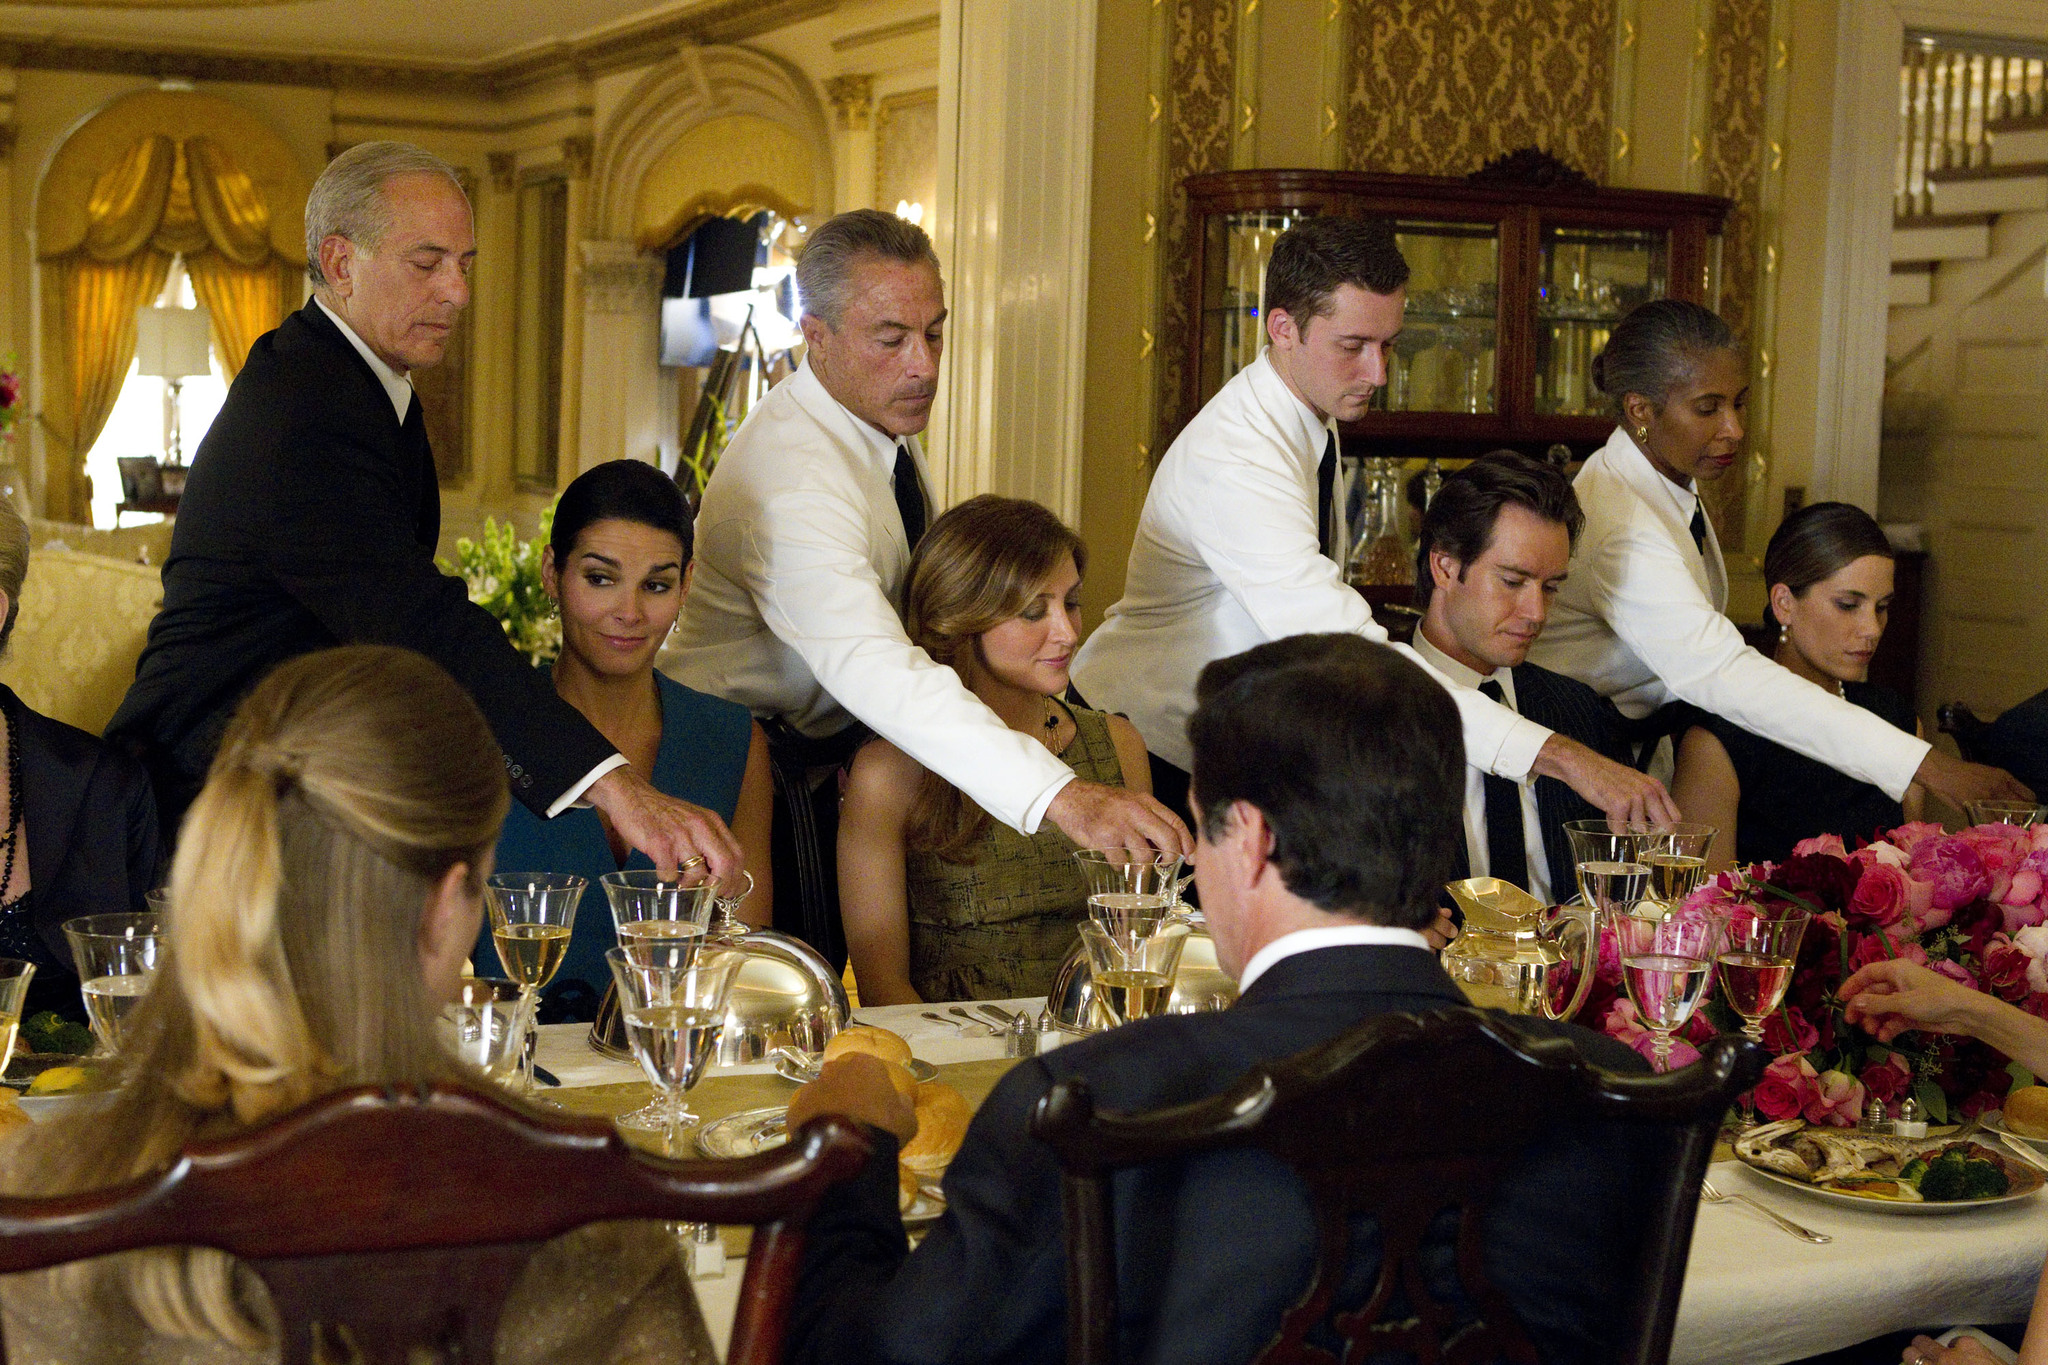 Maxine Bahns, Mark-Paul Gosselaar, Angie Harmon, and Sasha Alexander in Rizzoli & Isles (2010)